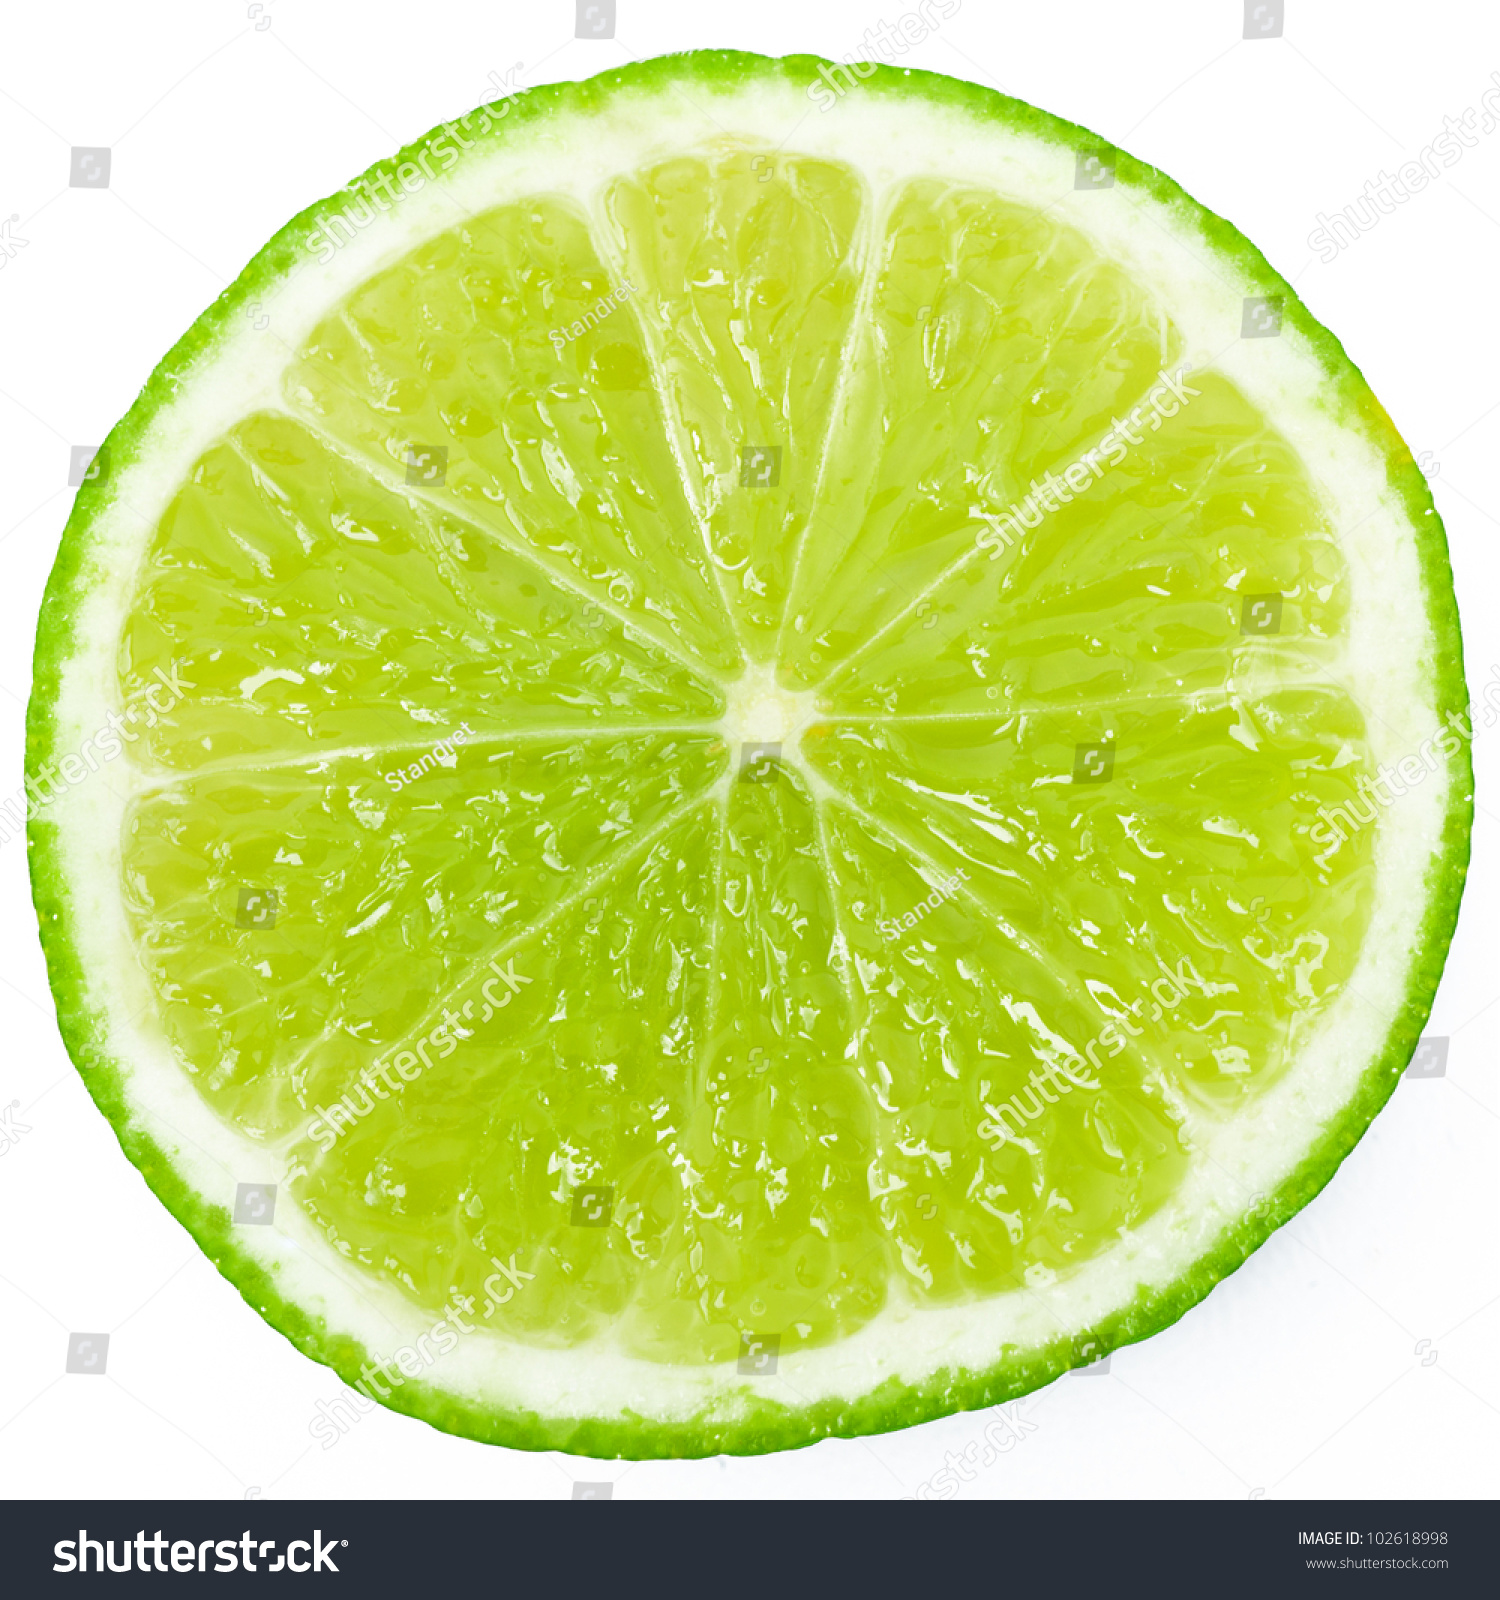 Green Citrus Fruit | Images Guru